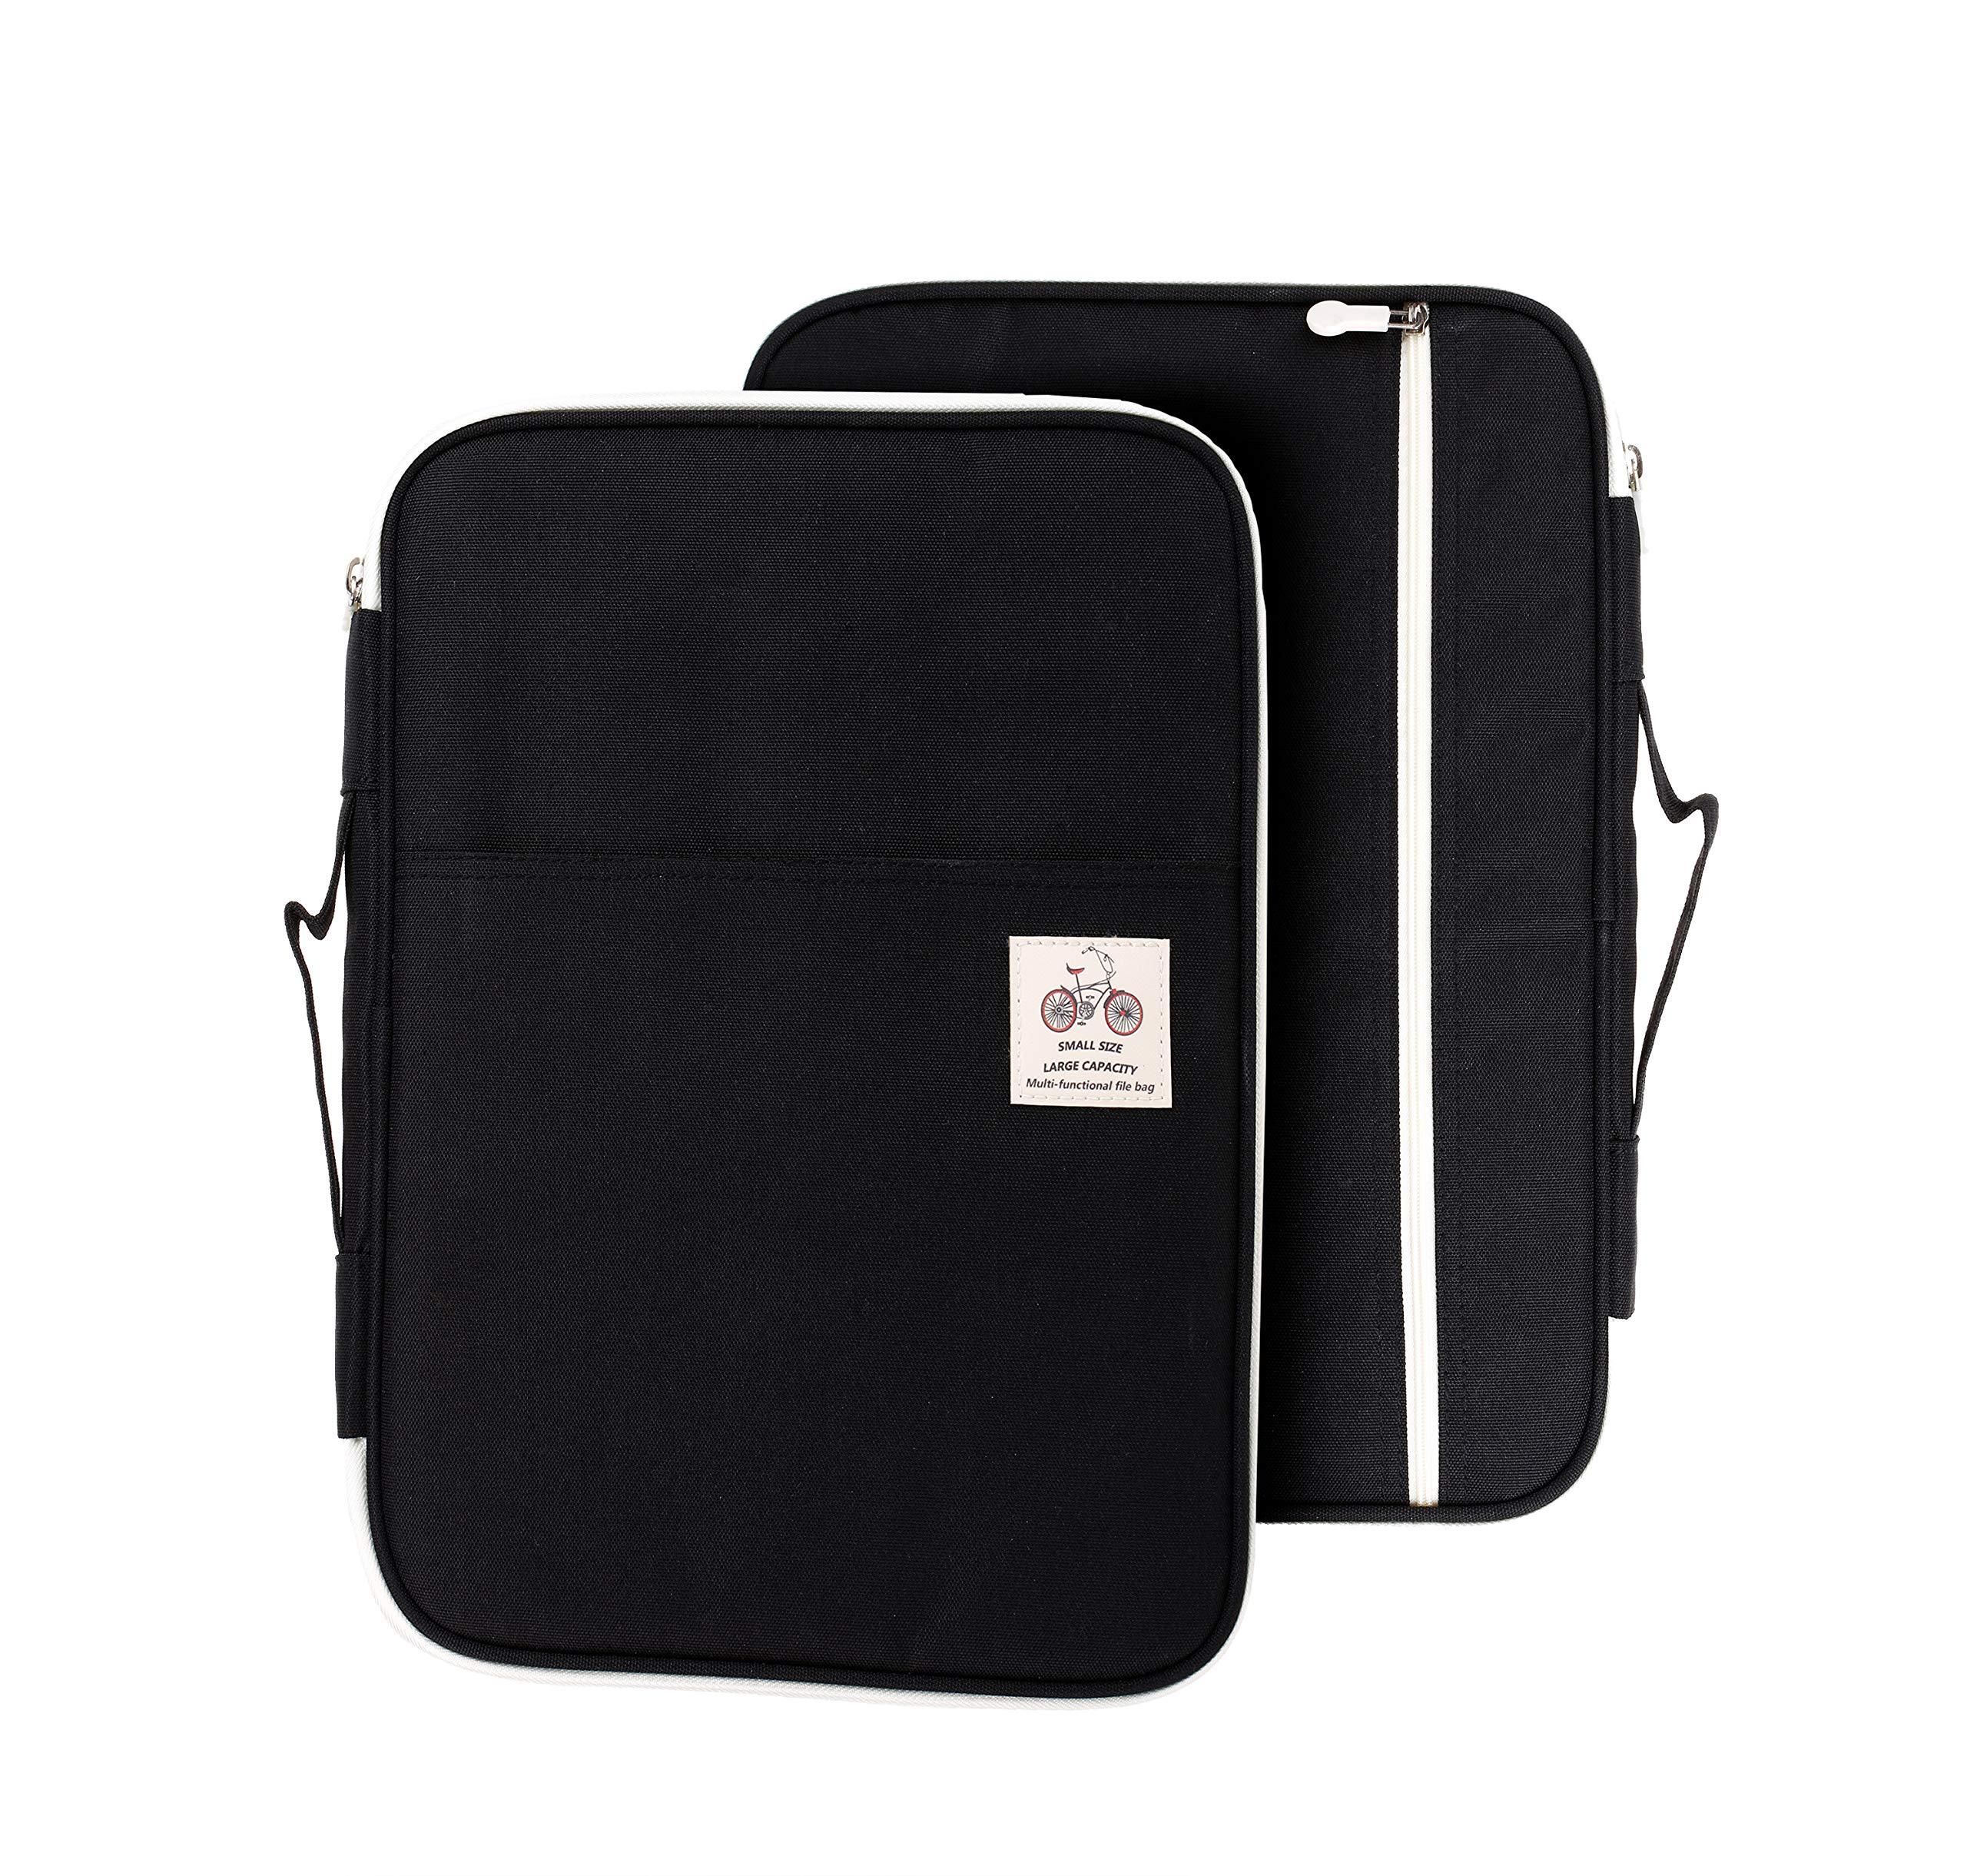 Lazyaunti Document Portfolio Padfolio Folders Organzier Binder Multi Function Waterproof Travel Pouch Zipper Case for Laptop, Ipad, Kindle, Notebook, Pen (Black)